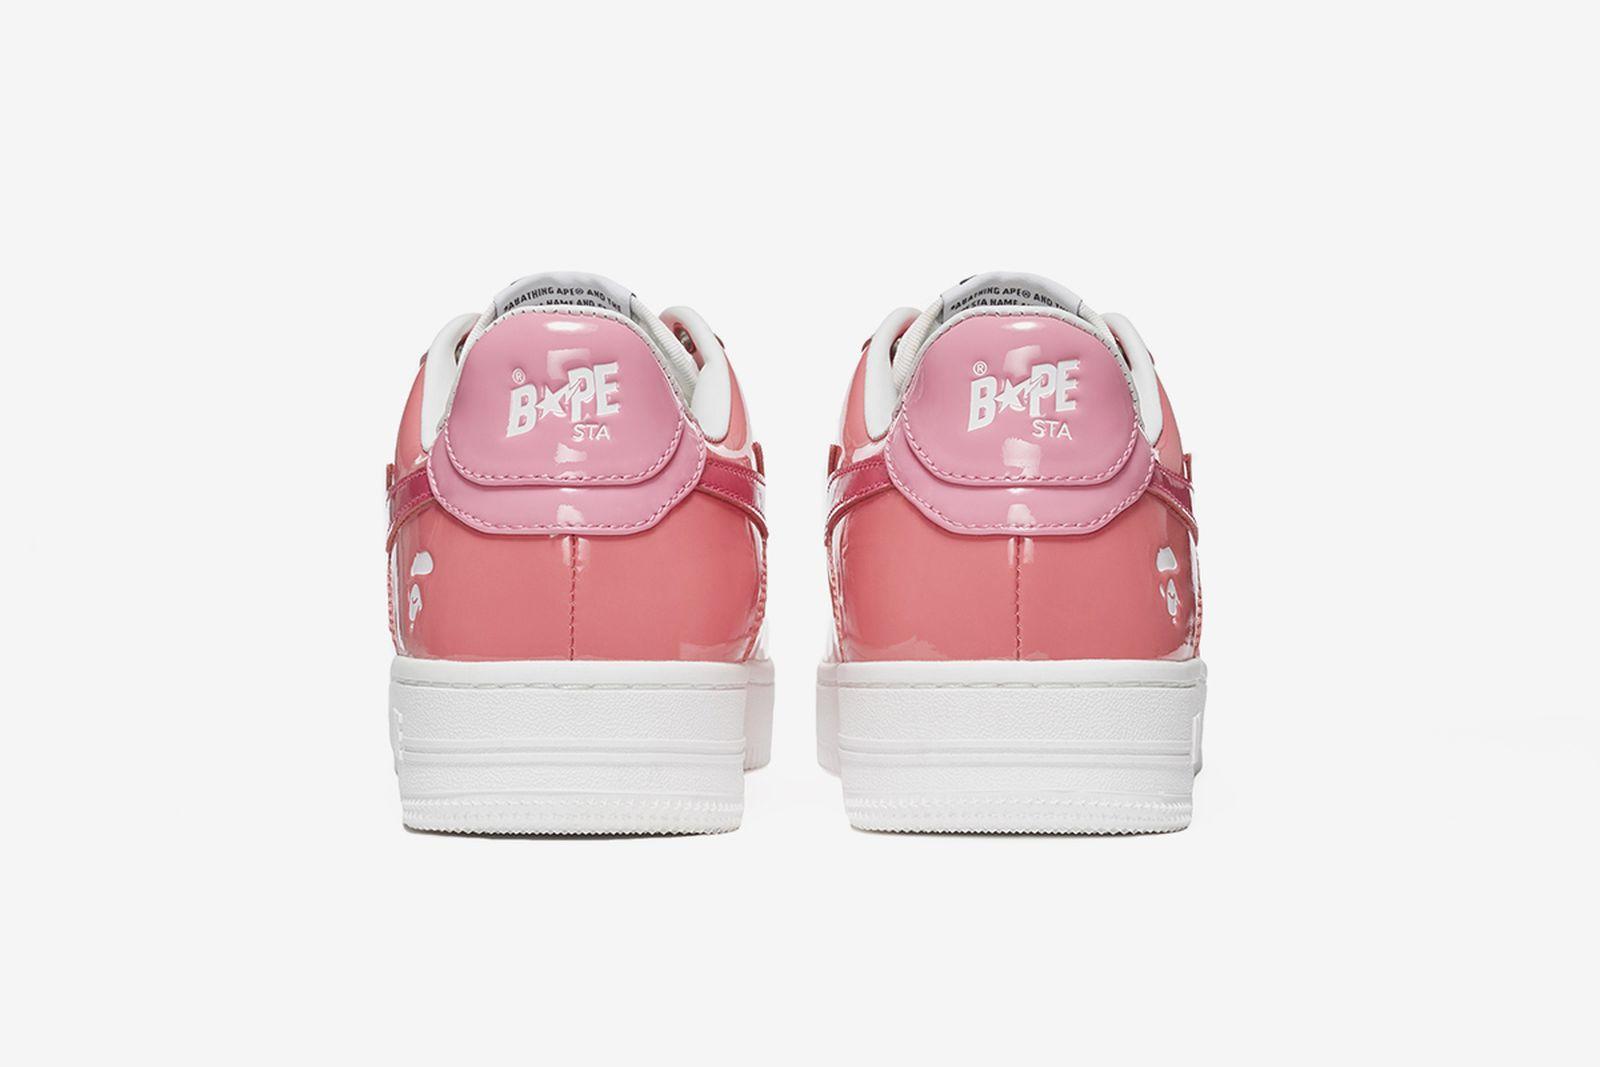 bape-sta-color-camo-combo-release-date-price-11